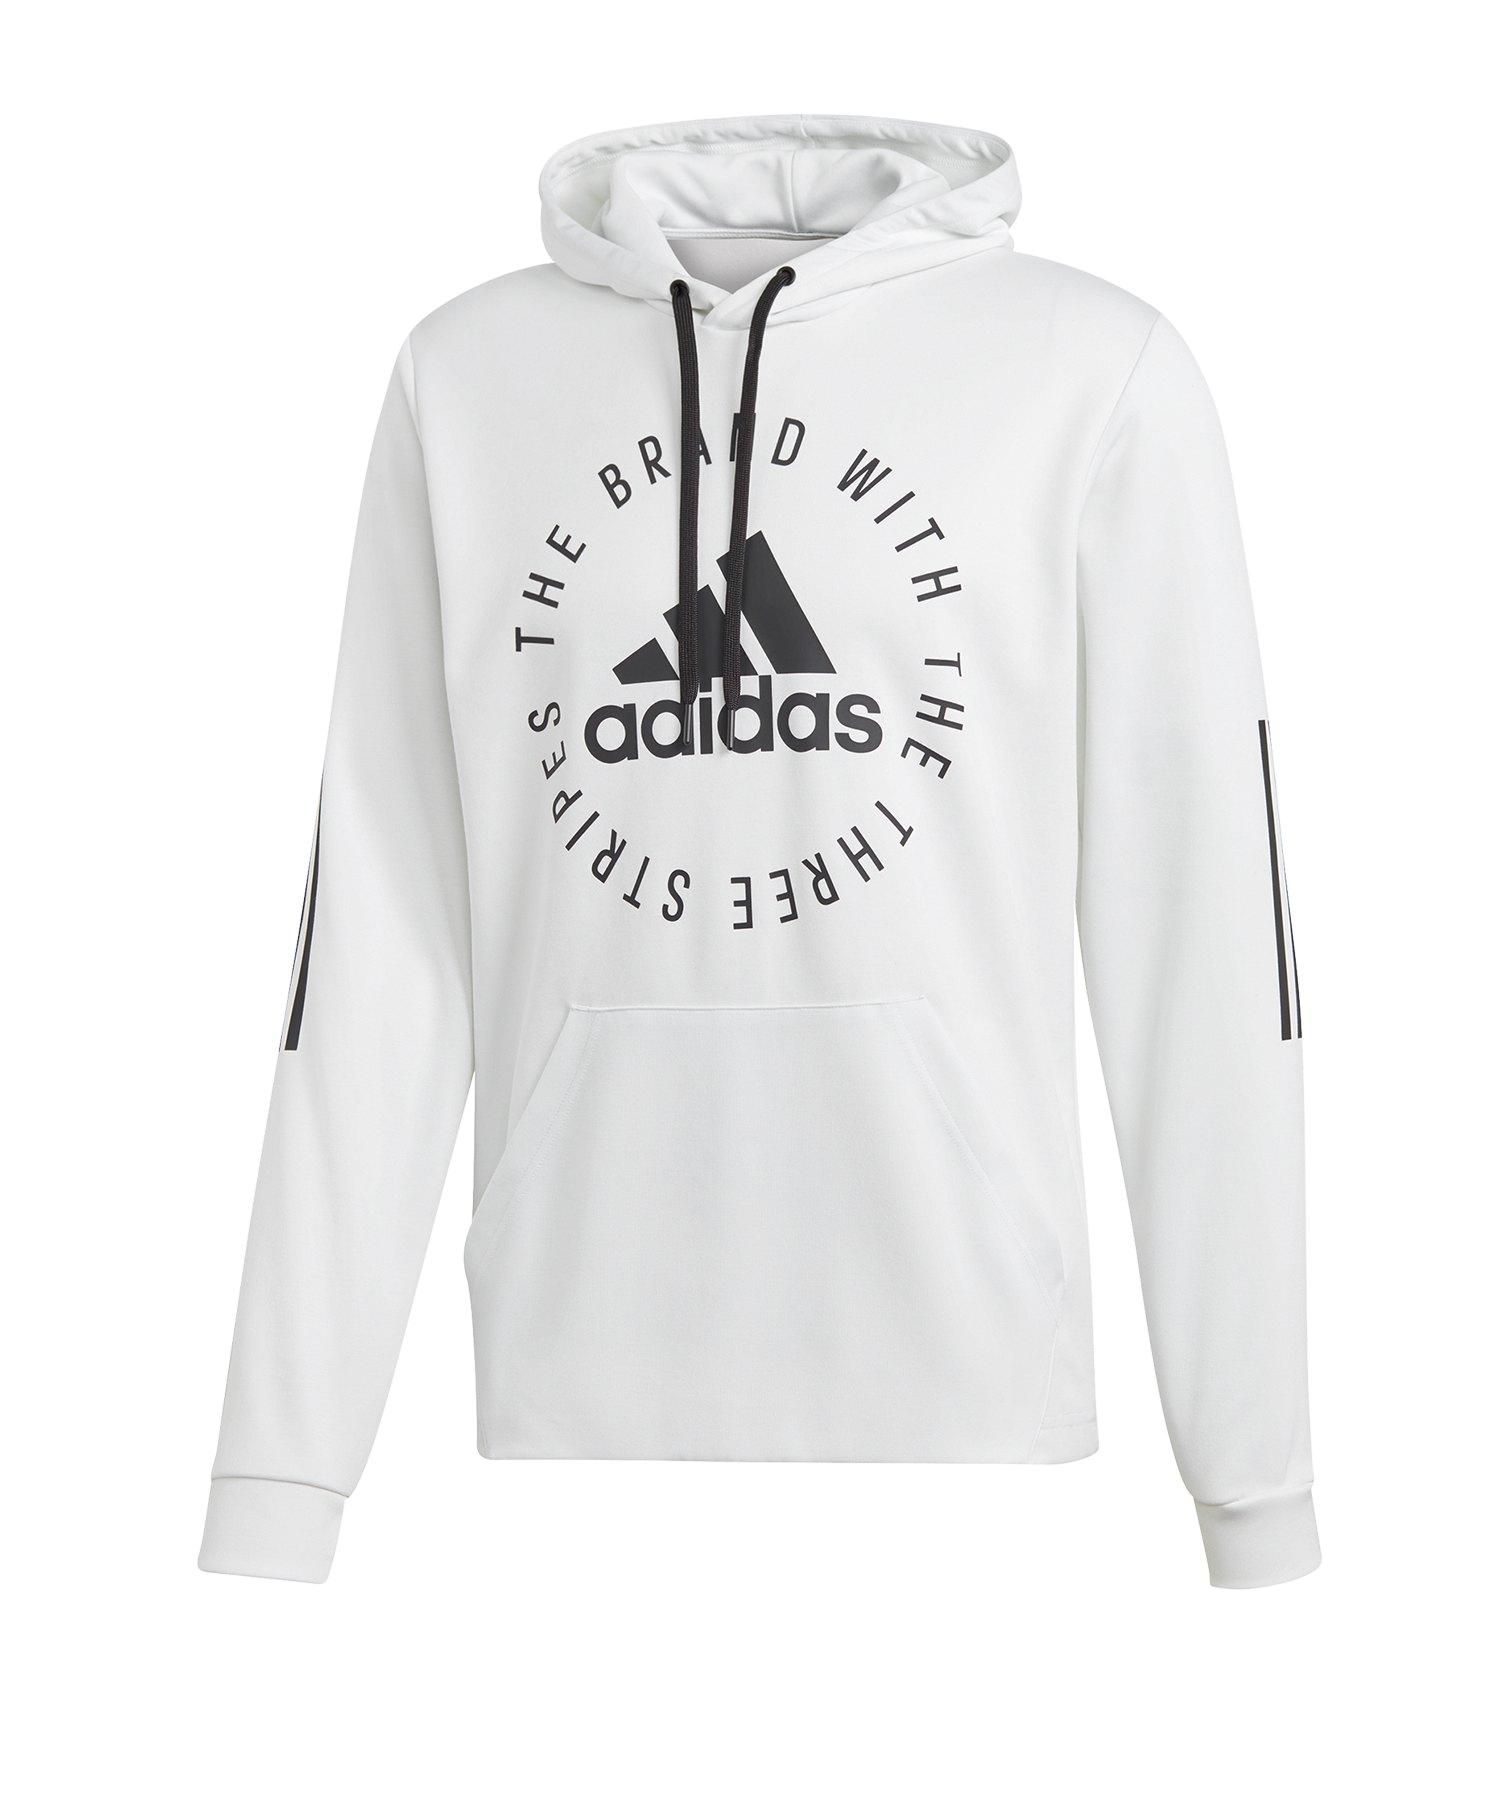 33376e740eff9 adidas Sport ID Kapuzensweatshirt Weiss Schwarz | Lifestyle ...